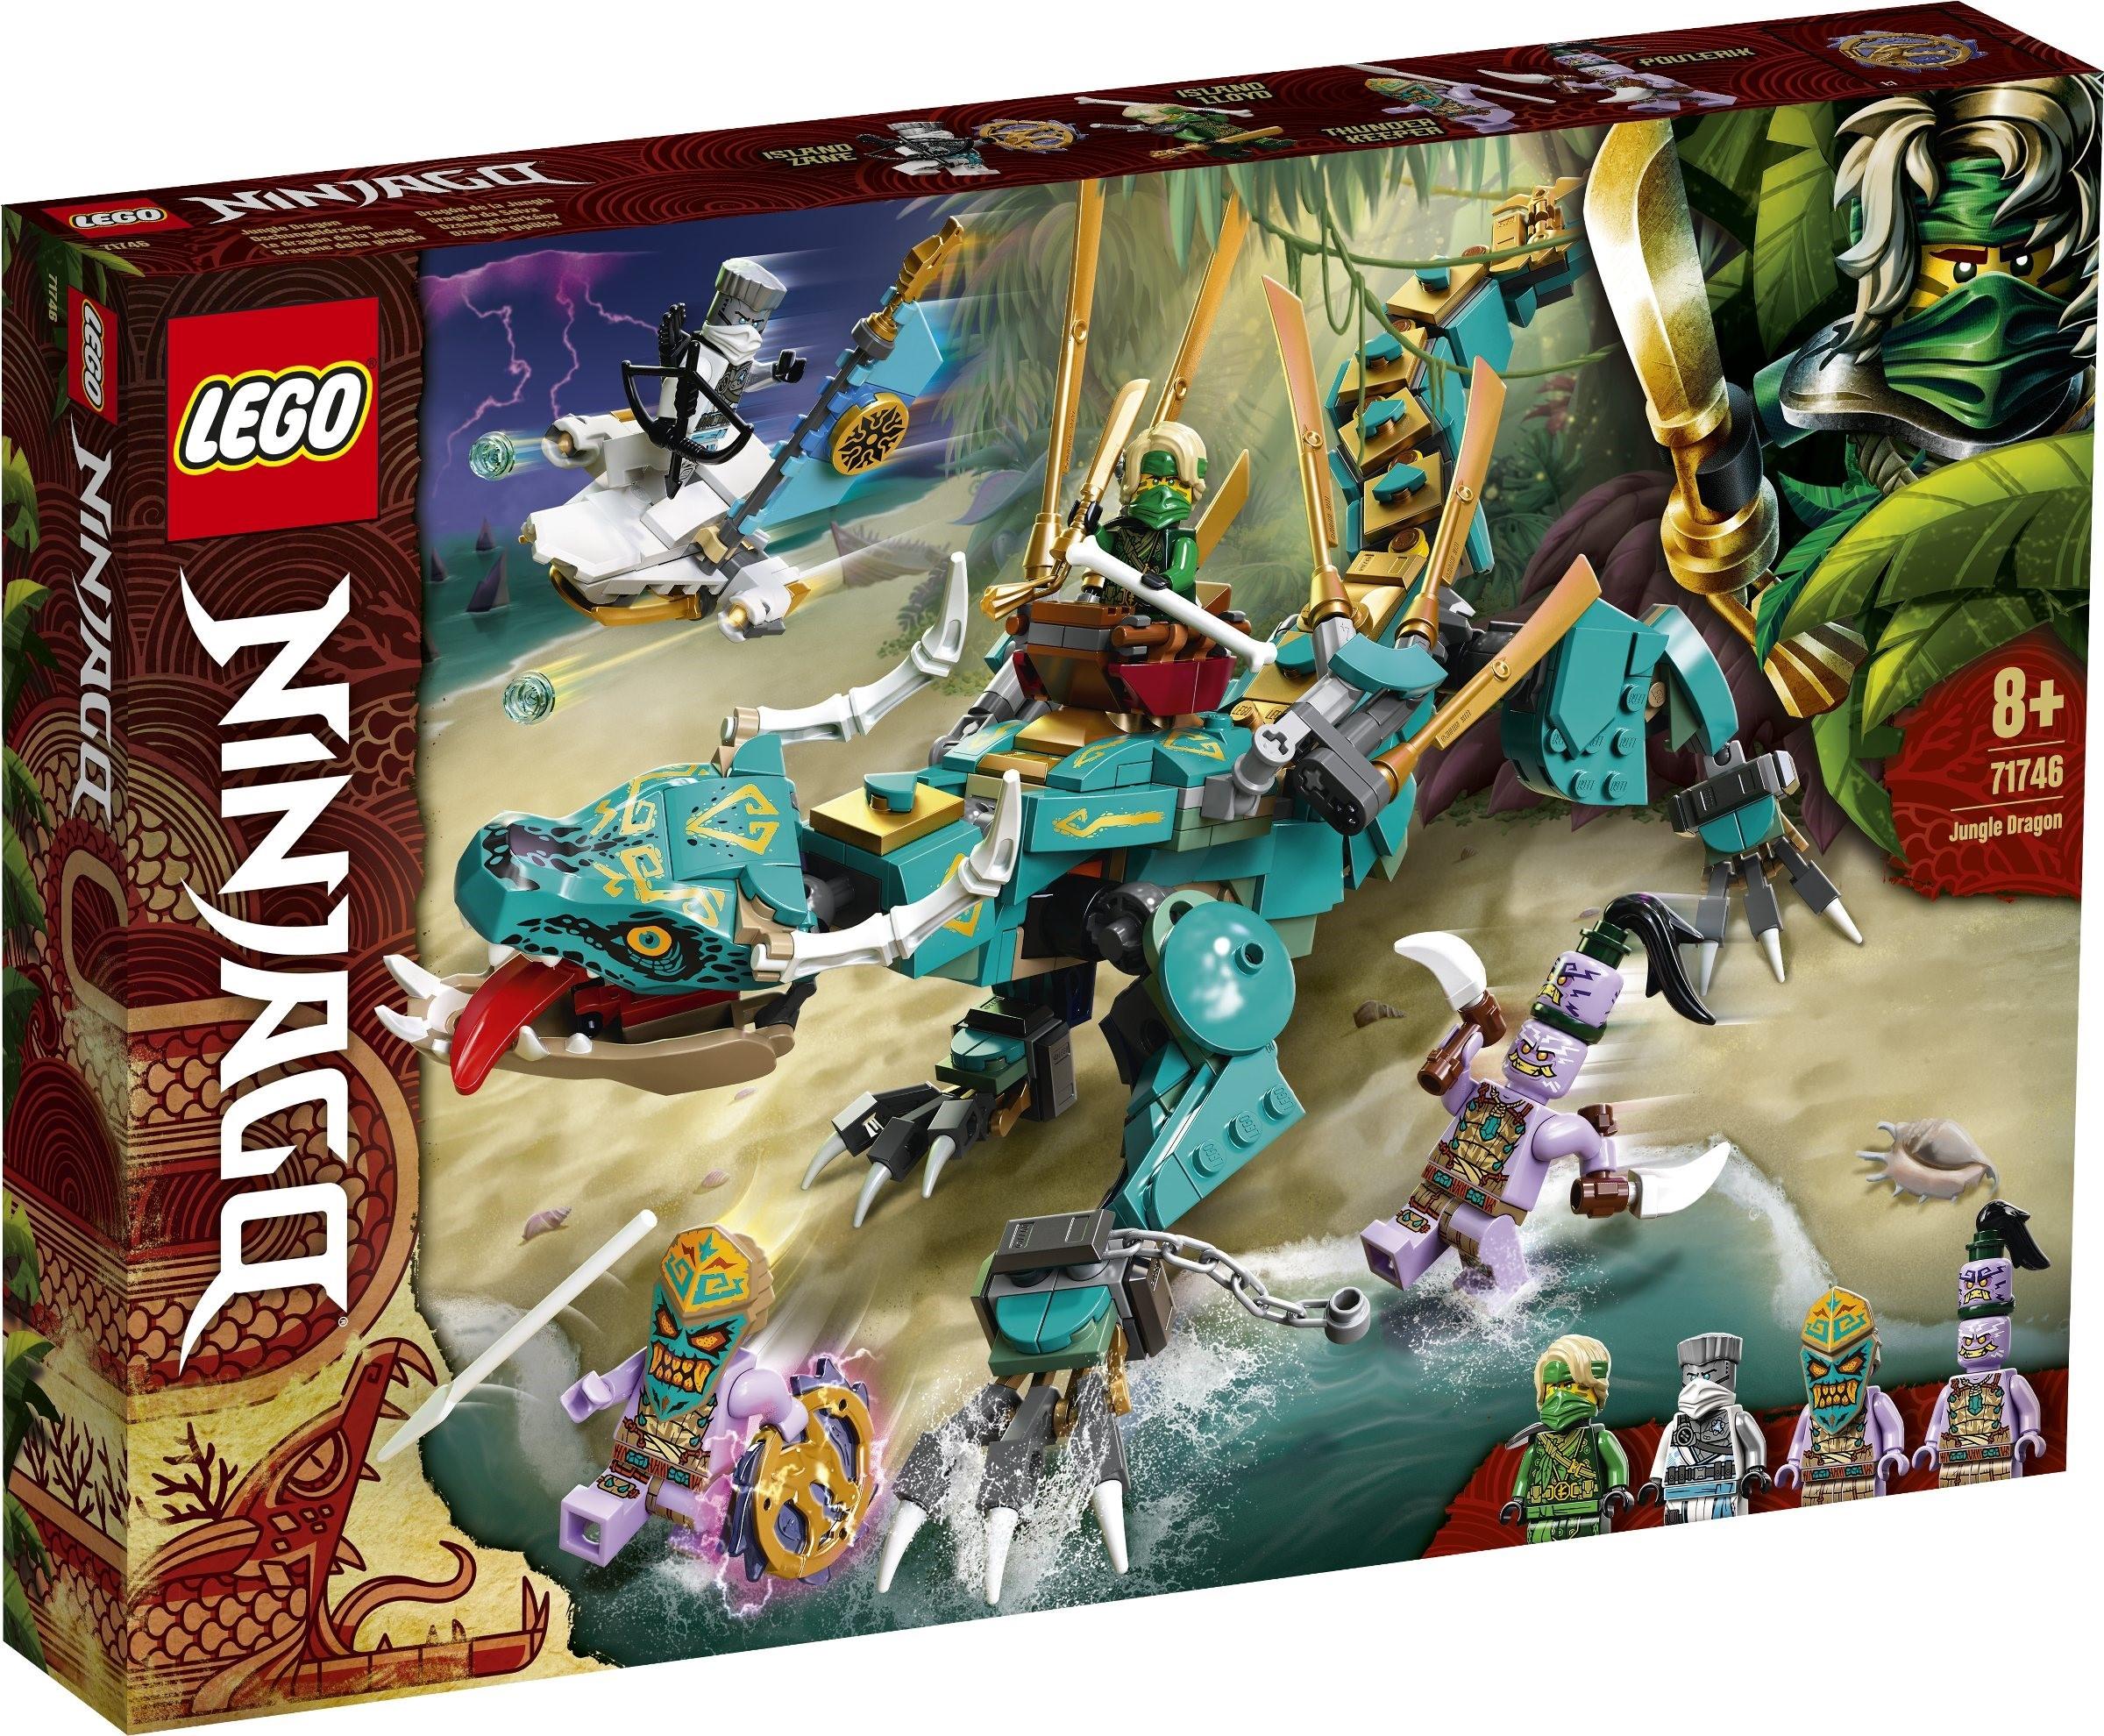 Огляд набору Lego Ninjago 71746 Jungle Dragon